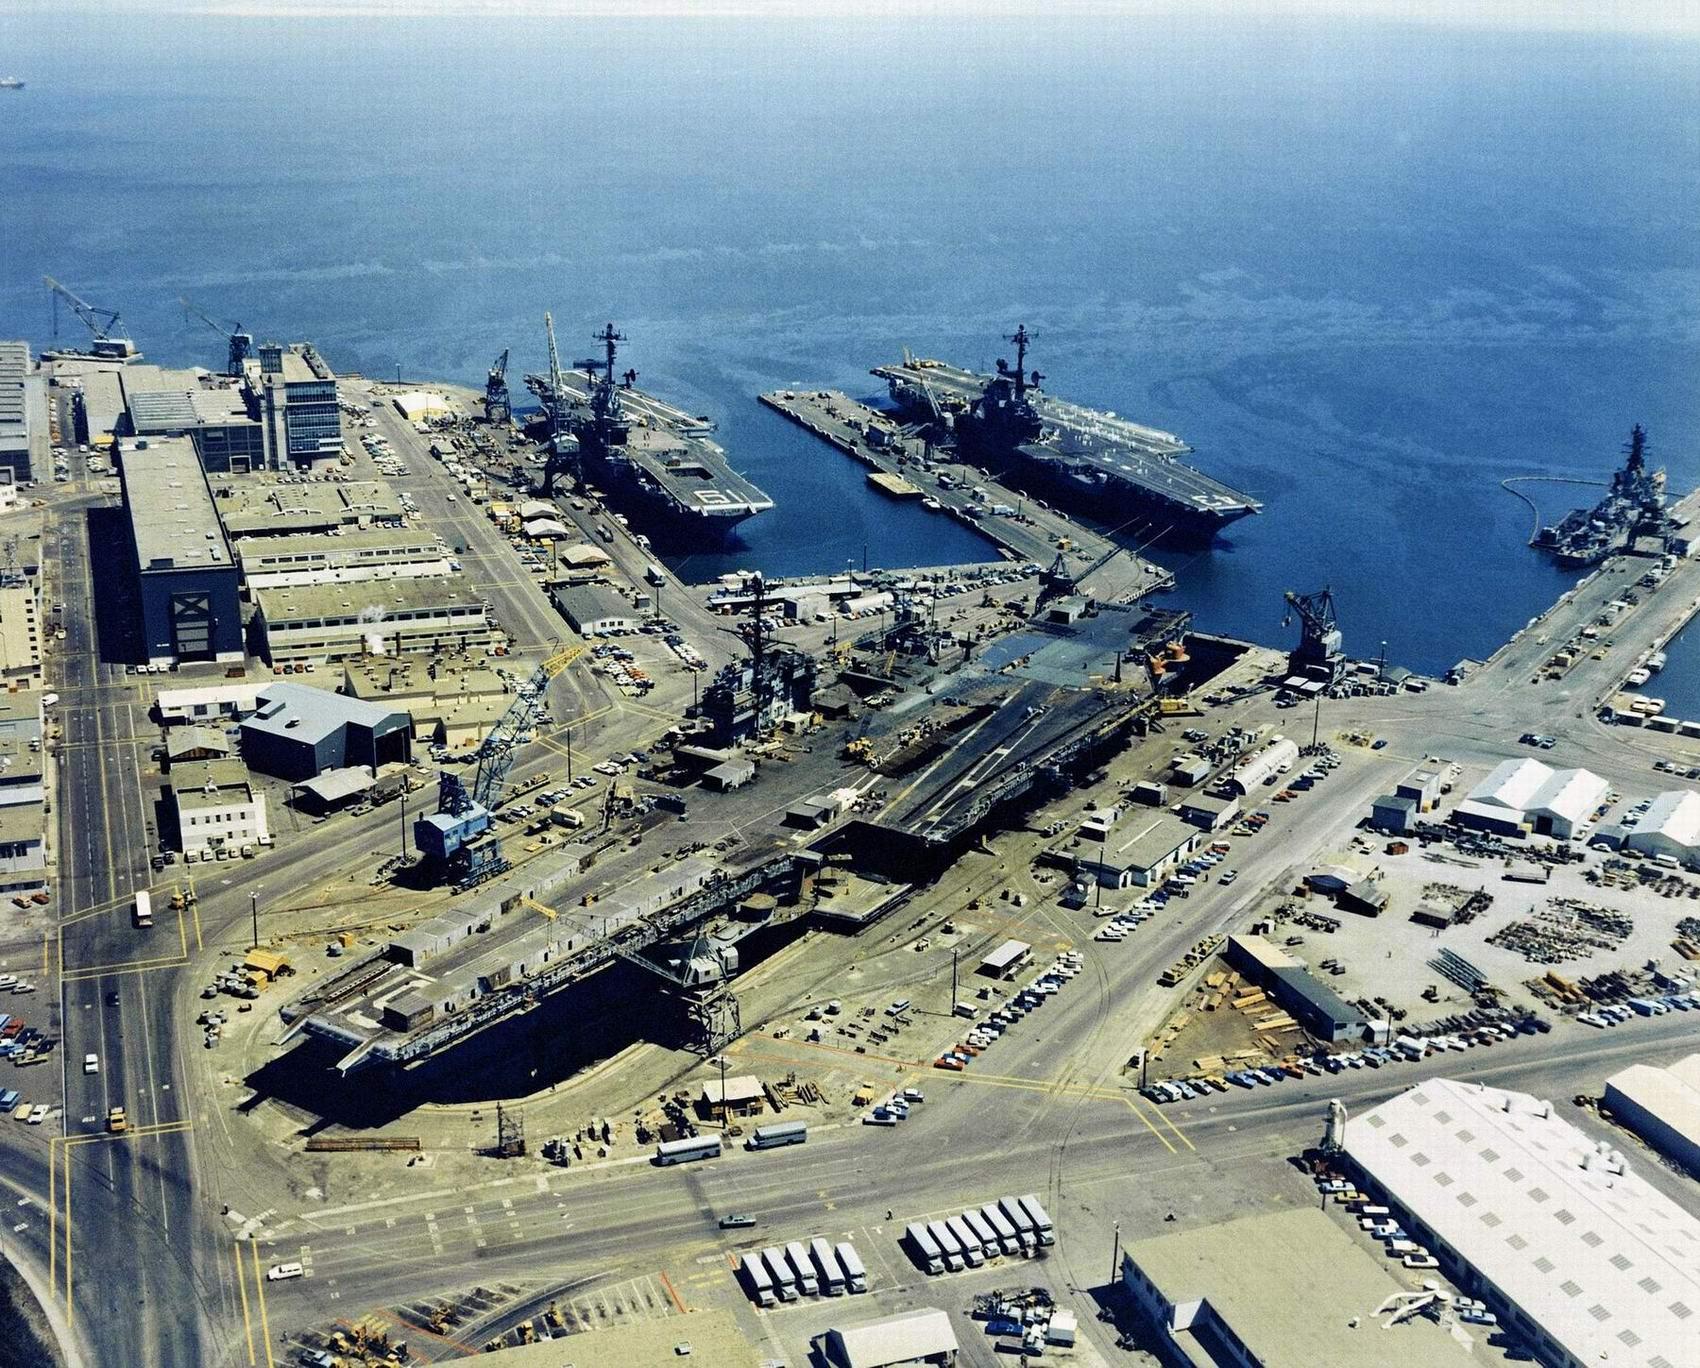 Hunter's Point Naval Shipyard on 25 August 1971 USS Ranger (CVA-61), USS Coral Sea (CVA-43), USS Hancock (CVA-19) - photo Lt. A. Legare, USN.jpg